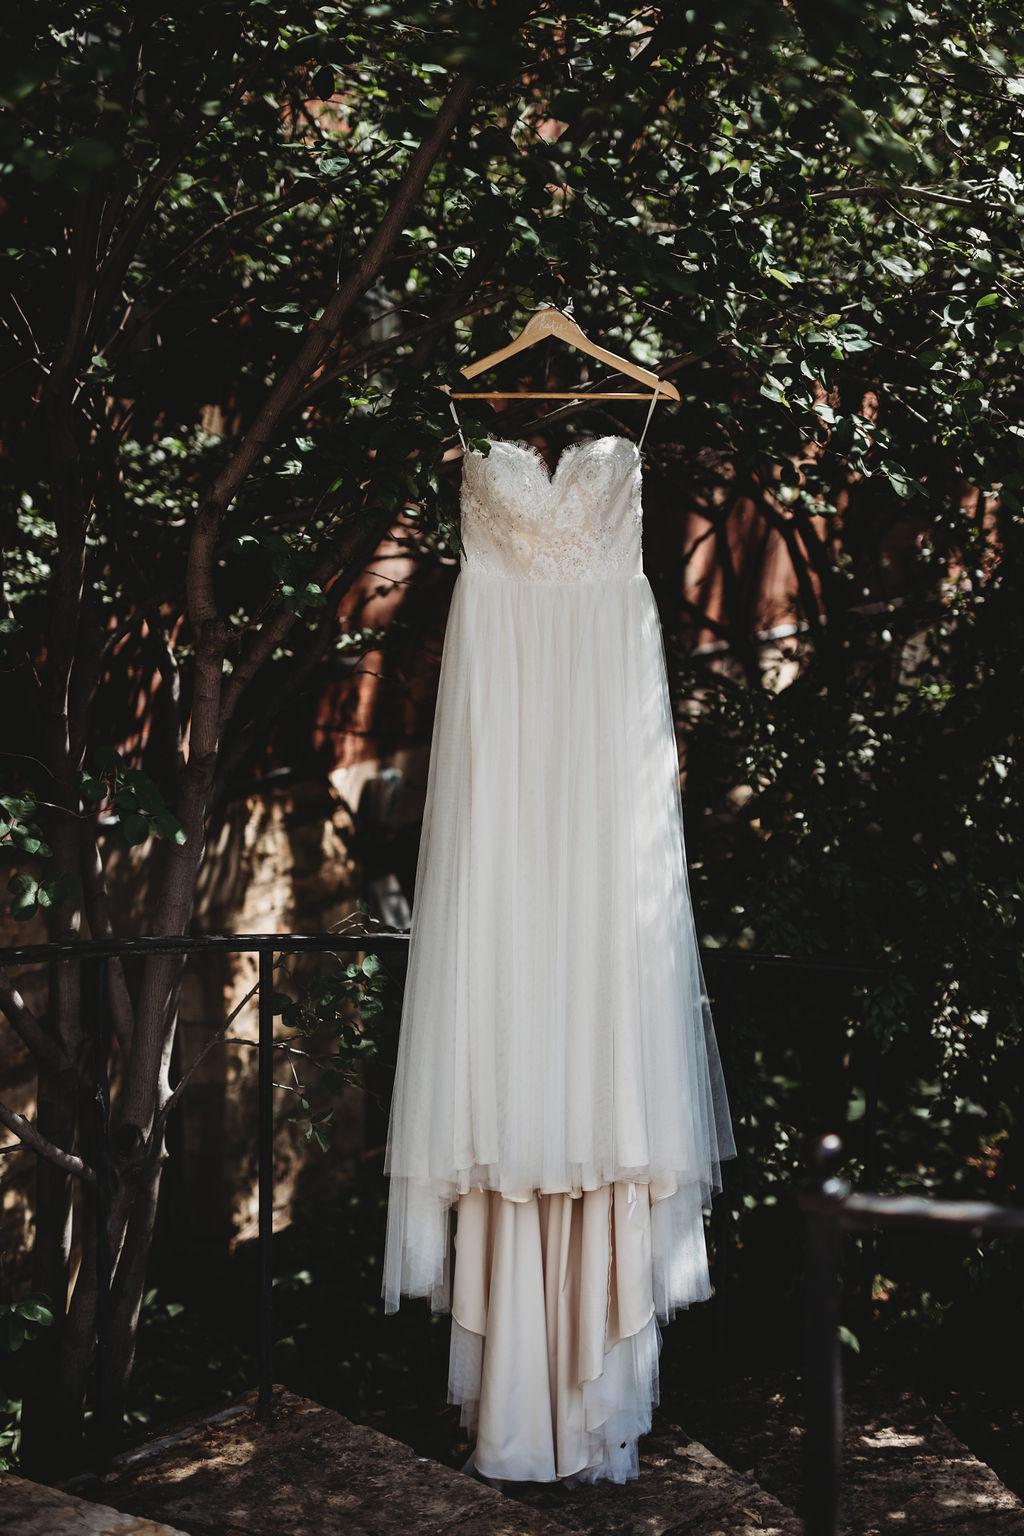 engle-olson-katie-dalton-wedding-clewell-photography-13.jpg